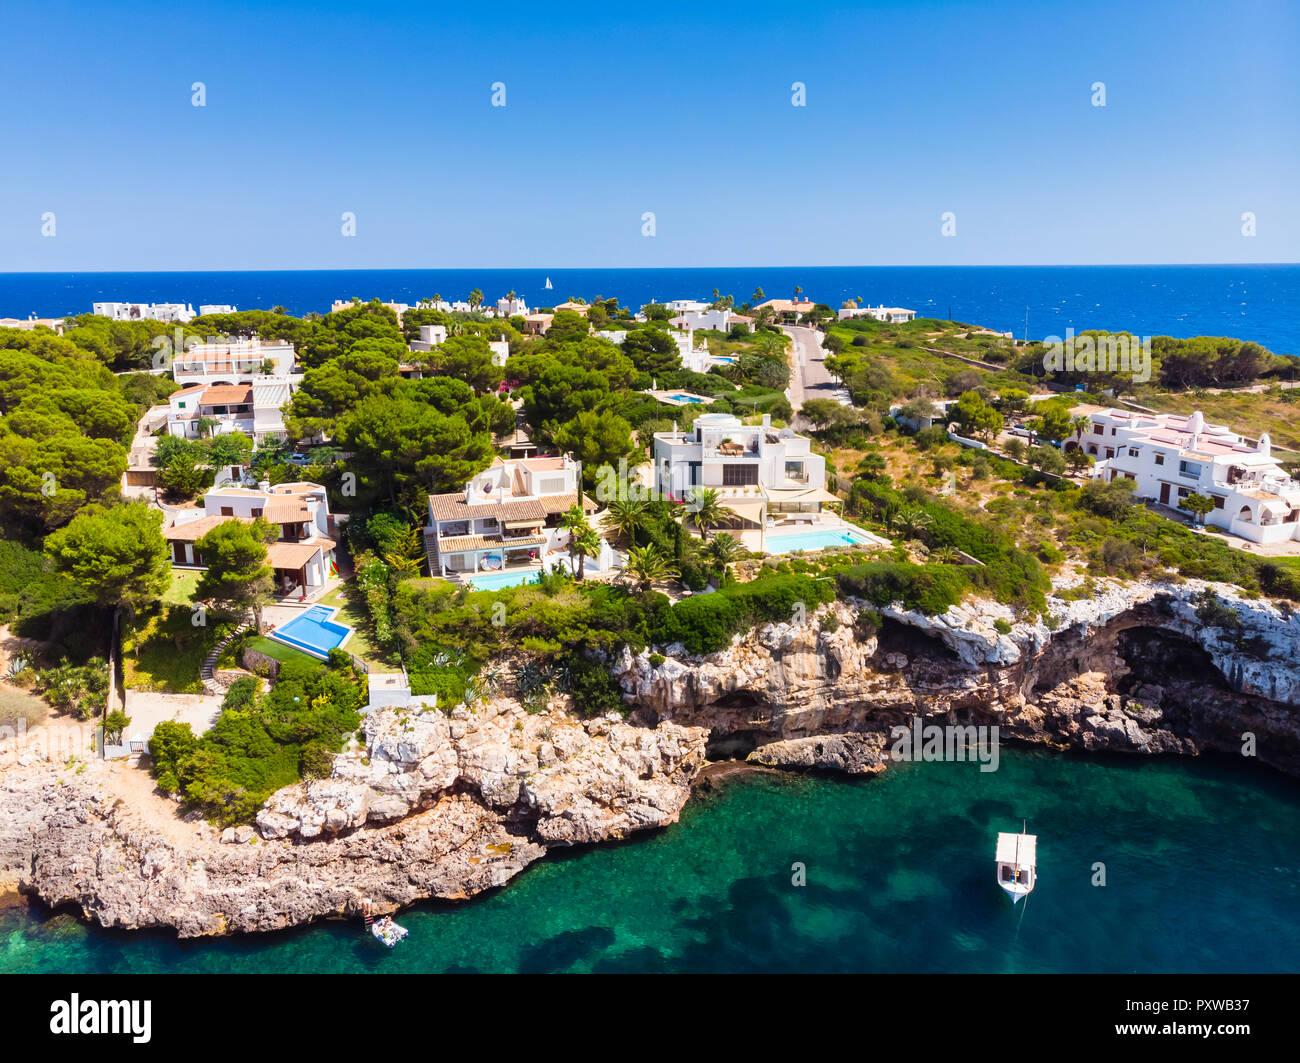 Spain, Mallorca, Portocolom, Punta de ses Crestes, Bay of Portocolom, Luxus villas - Stock Image